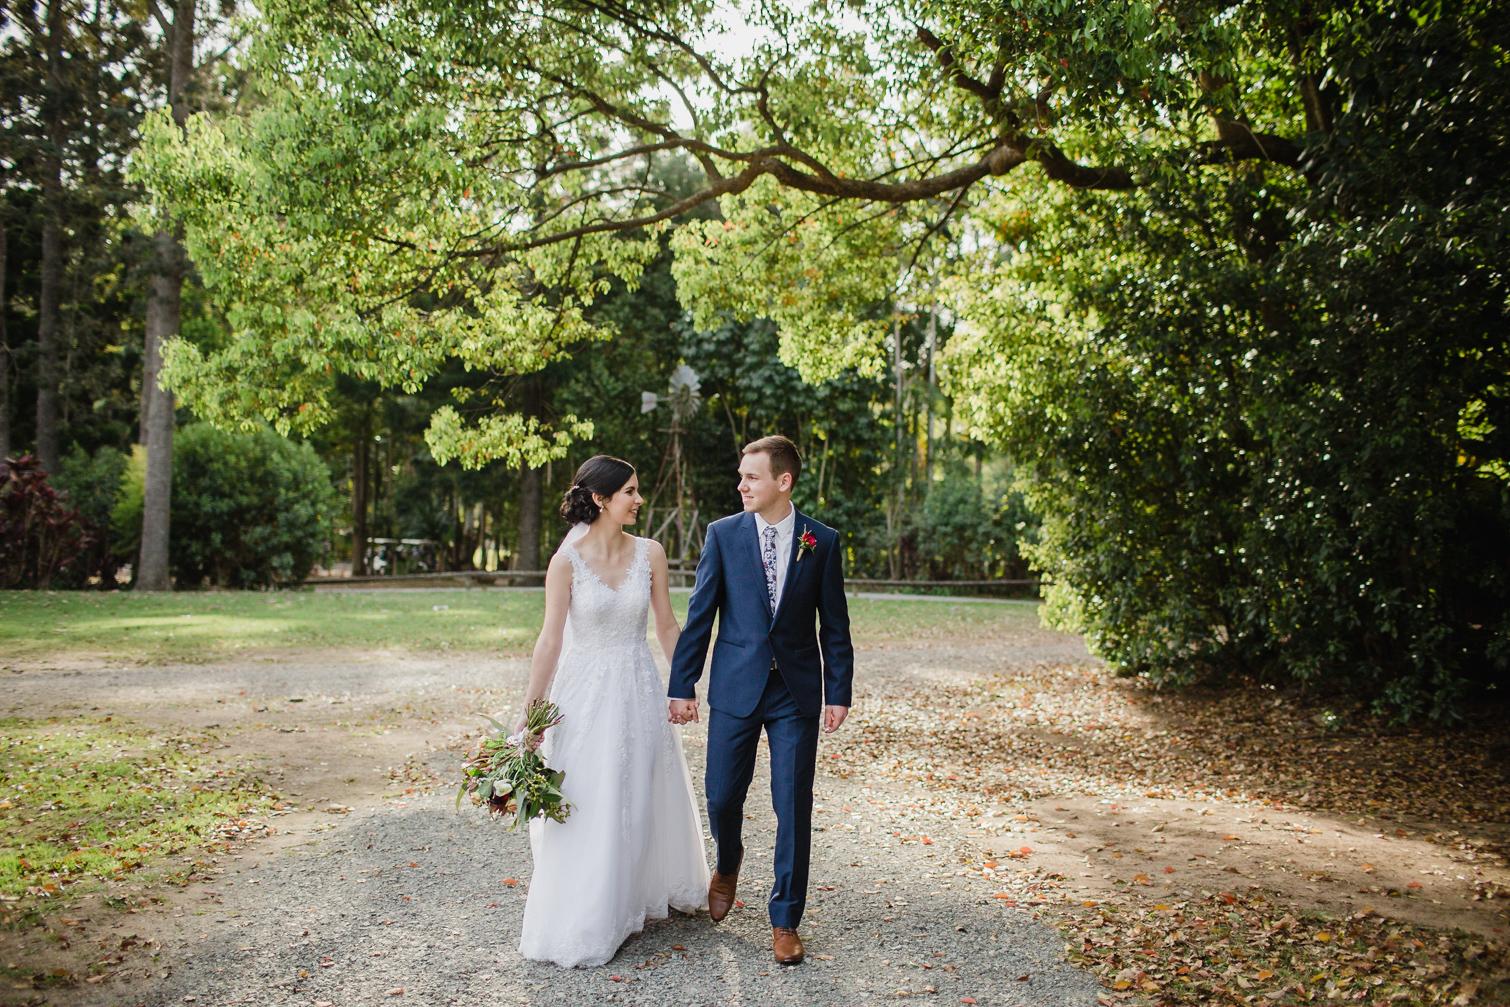 Boomerang_Farm_Gold_Coast_Wedding_Photography-146.jpg